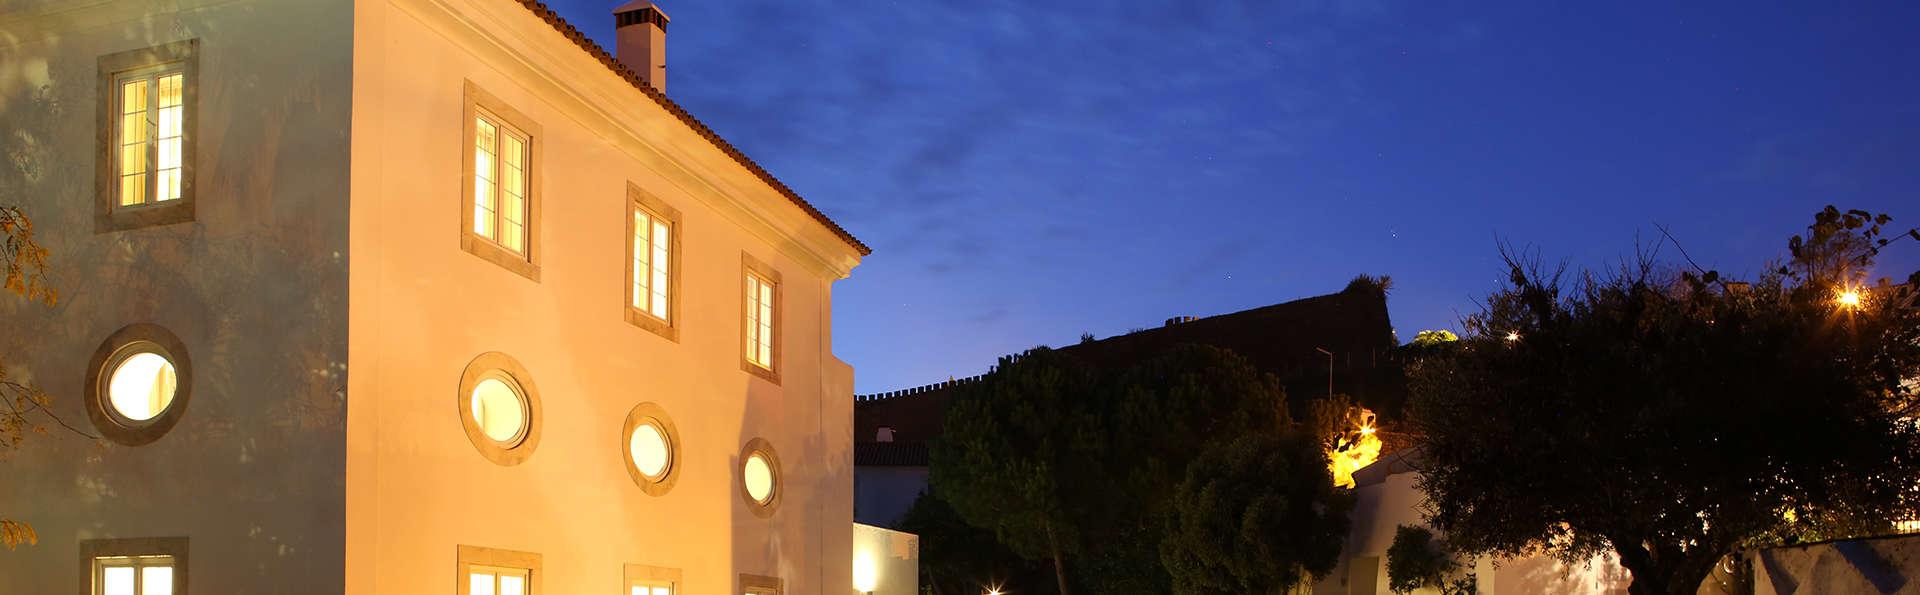 Pateo Dos Solares Charm Hotel - edit_facade3.jpg